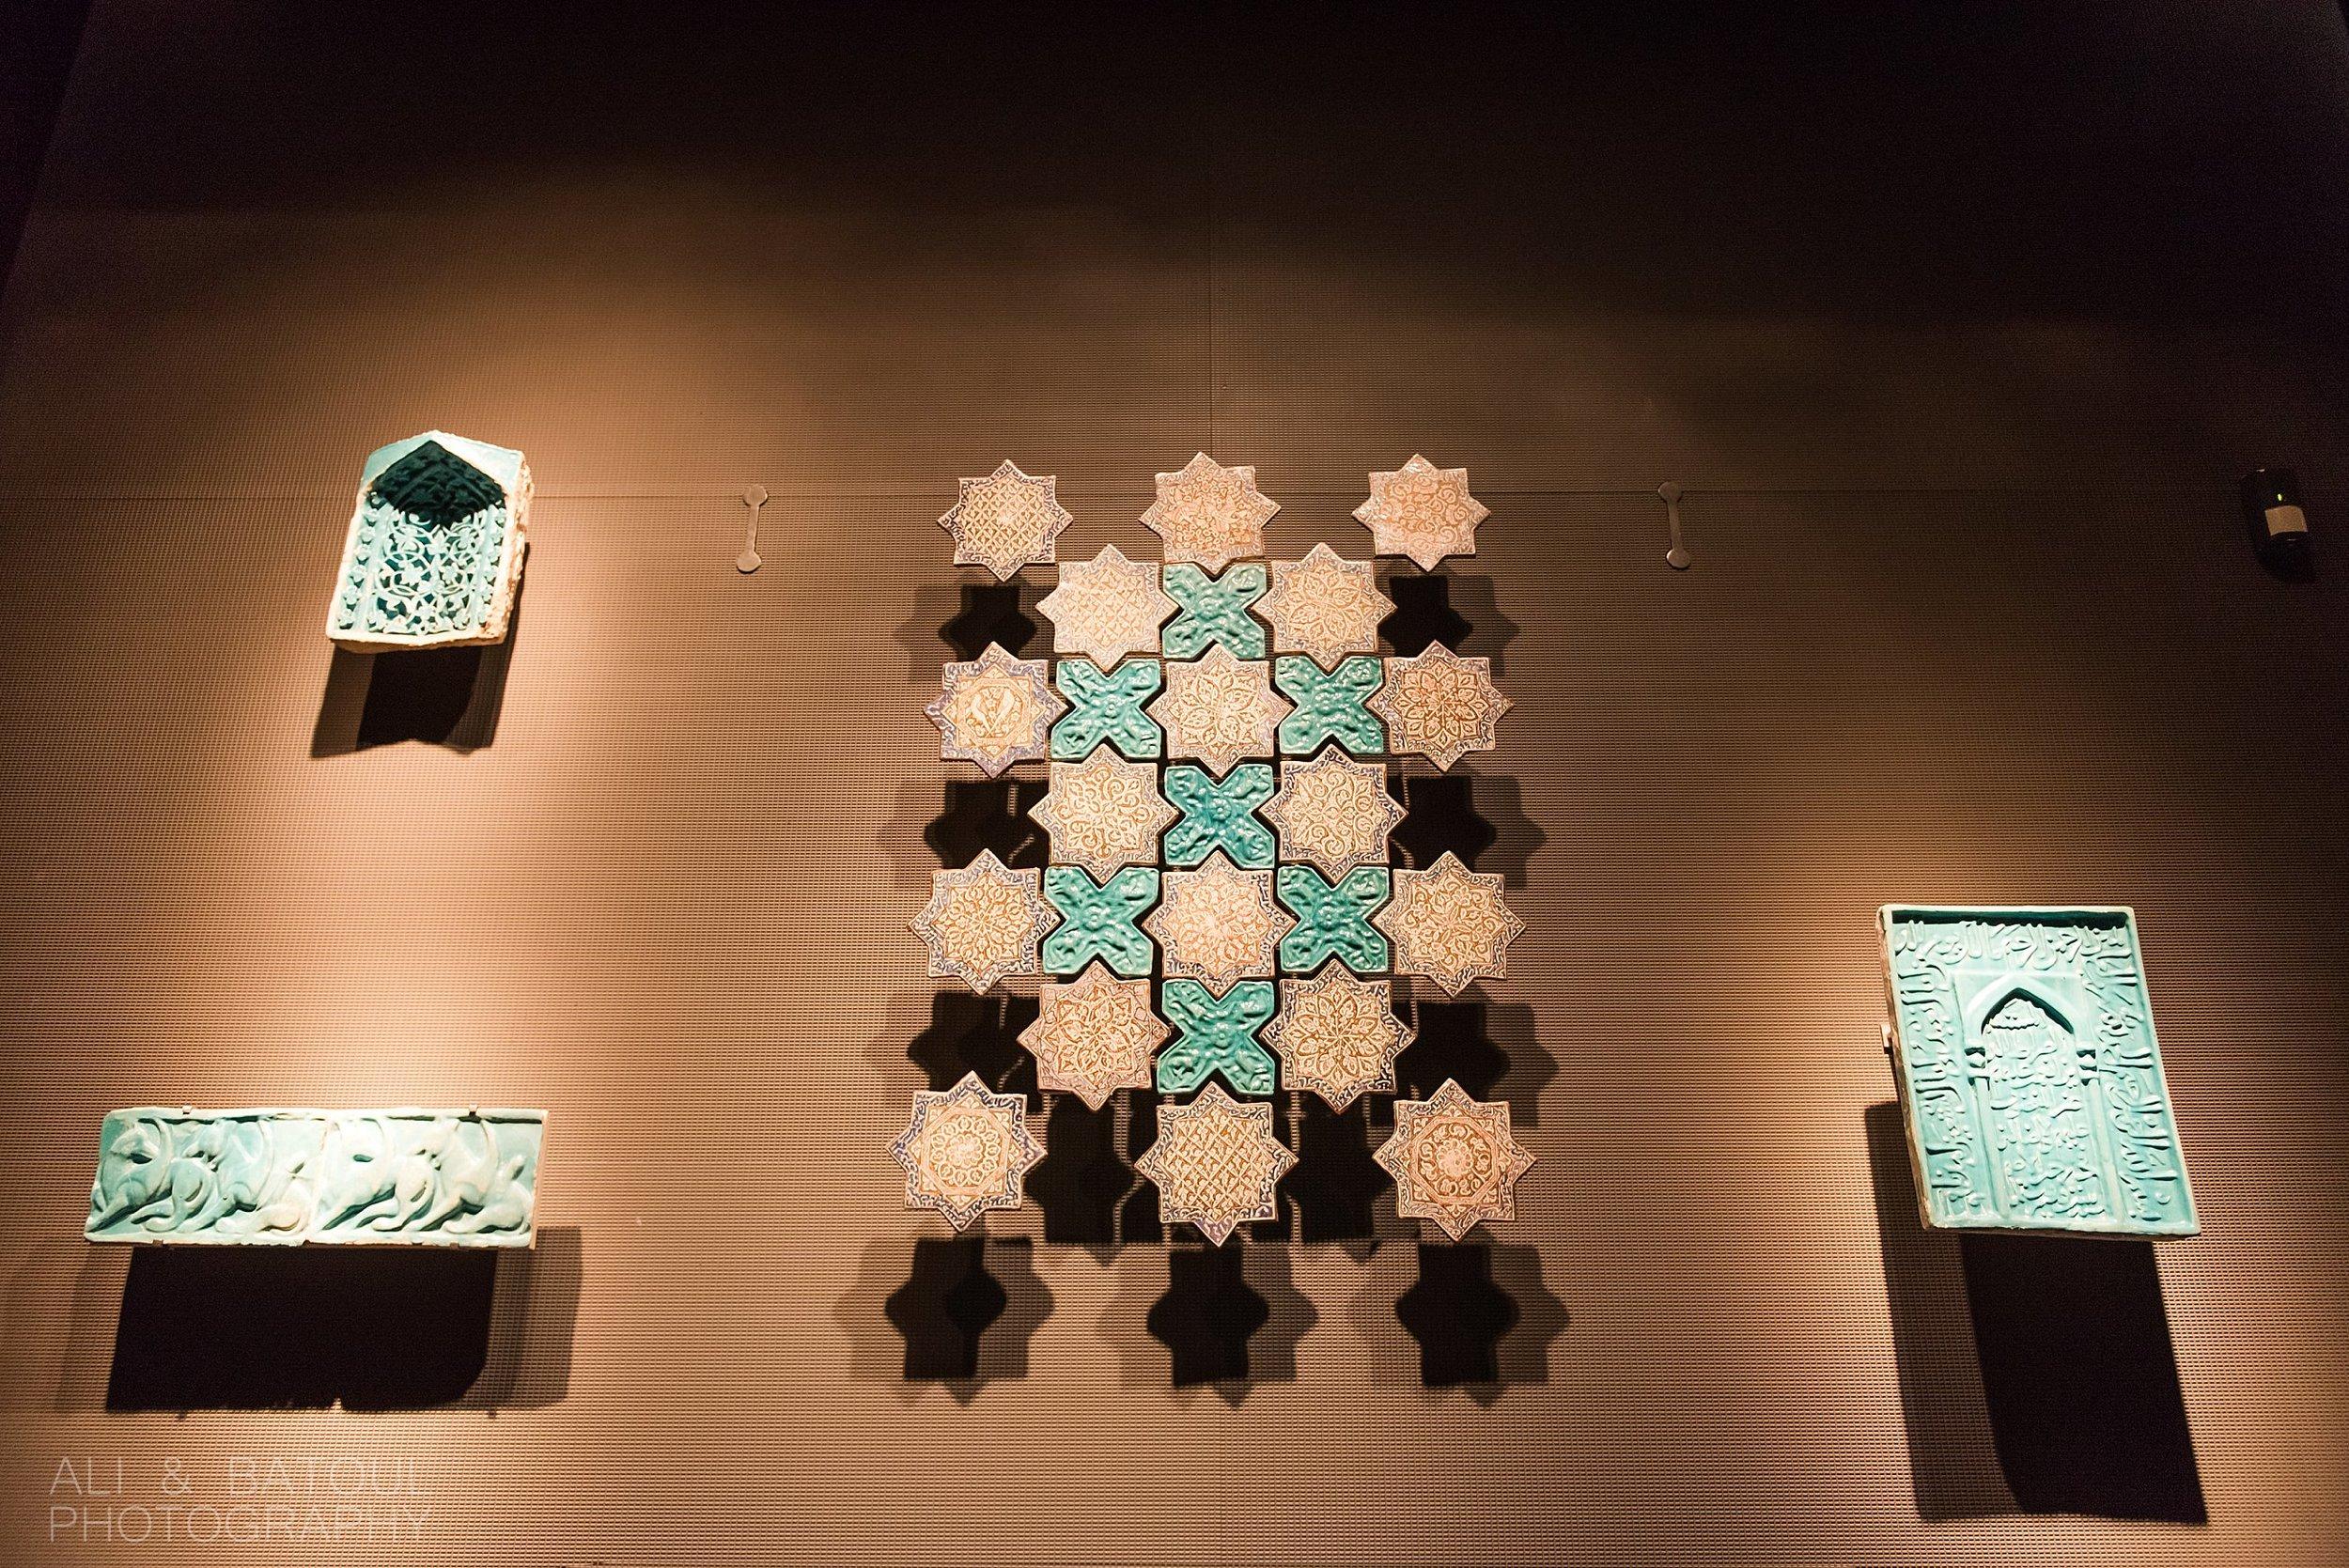 Ali & Batoul Photography - Doha Travel Photography_0013.jpg